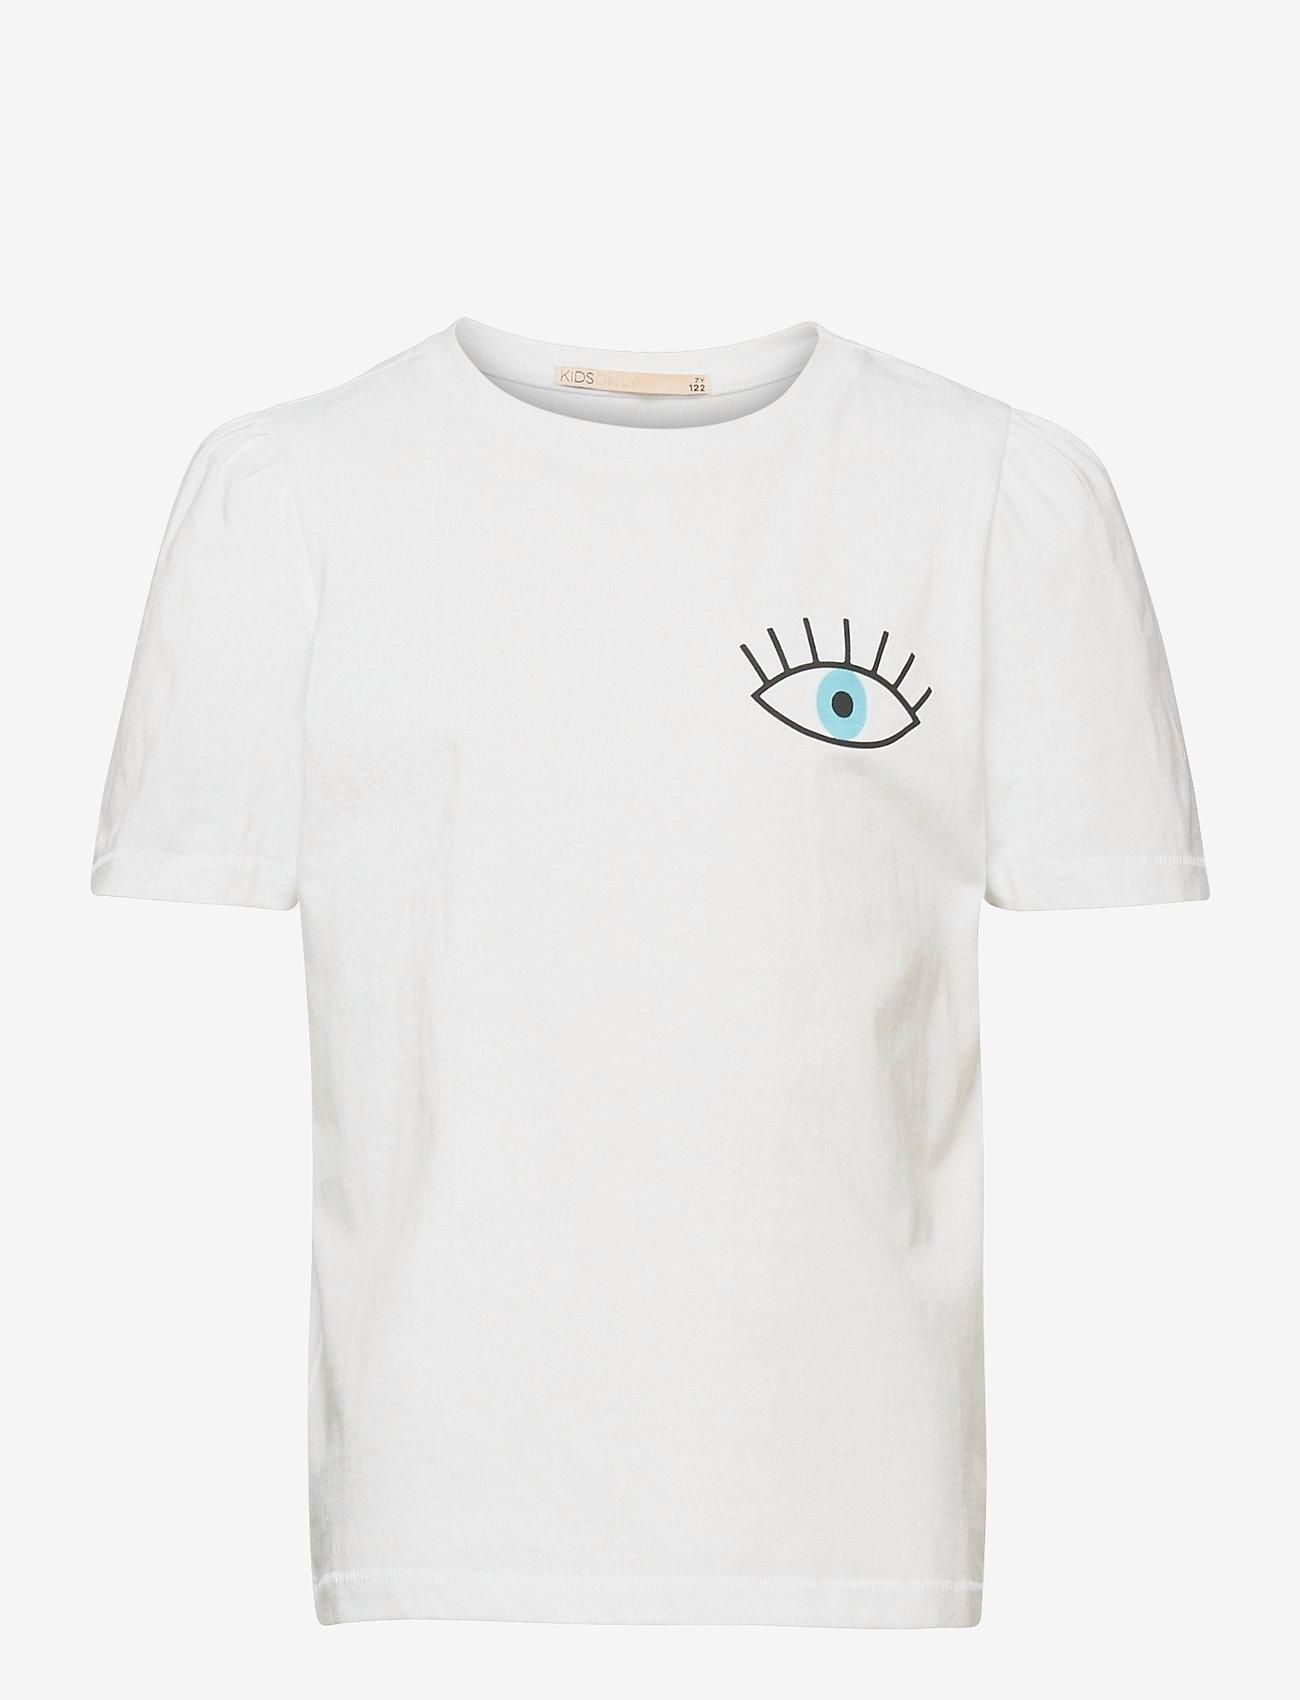 Kids Only - KONNORA LIFE VOLUME SS DNM TEE - t-shirts - white - 0